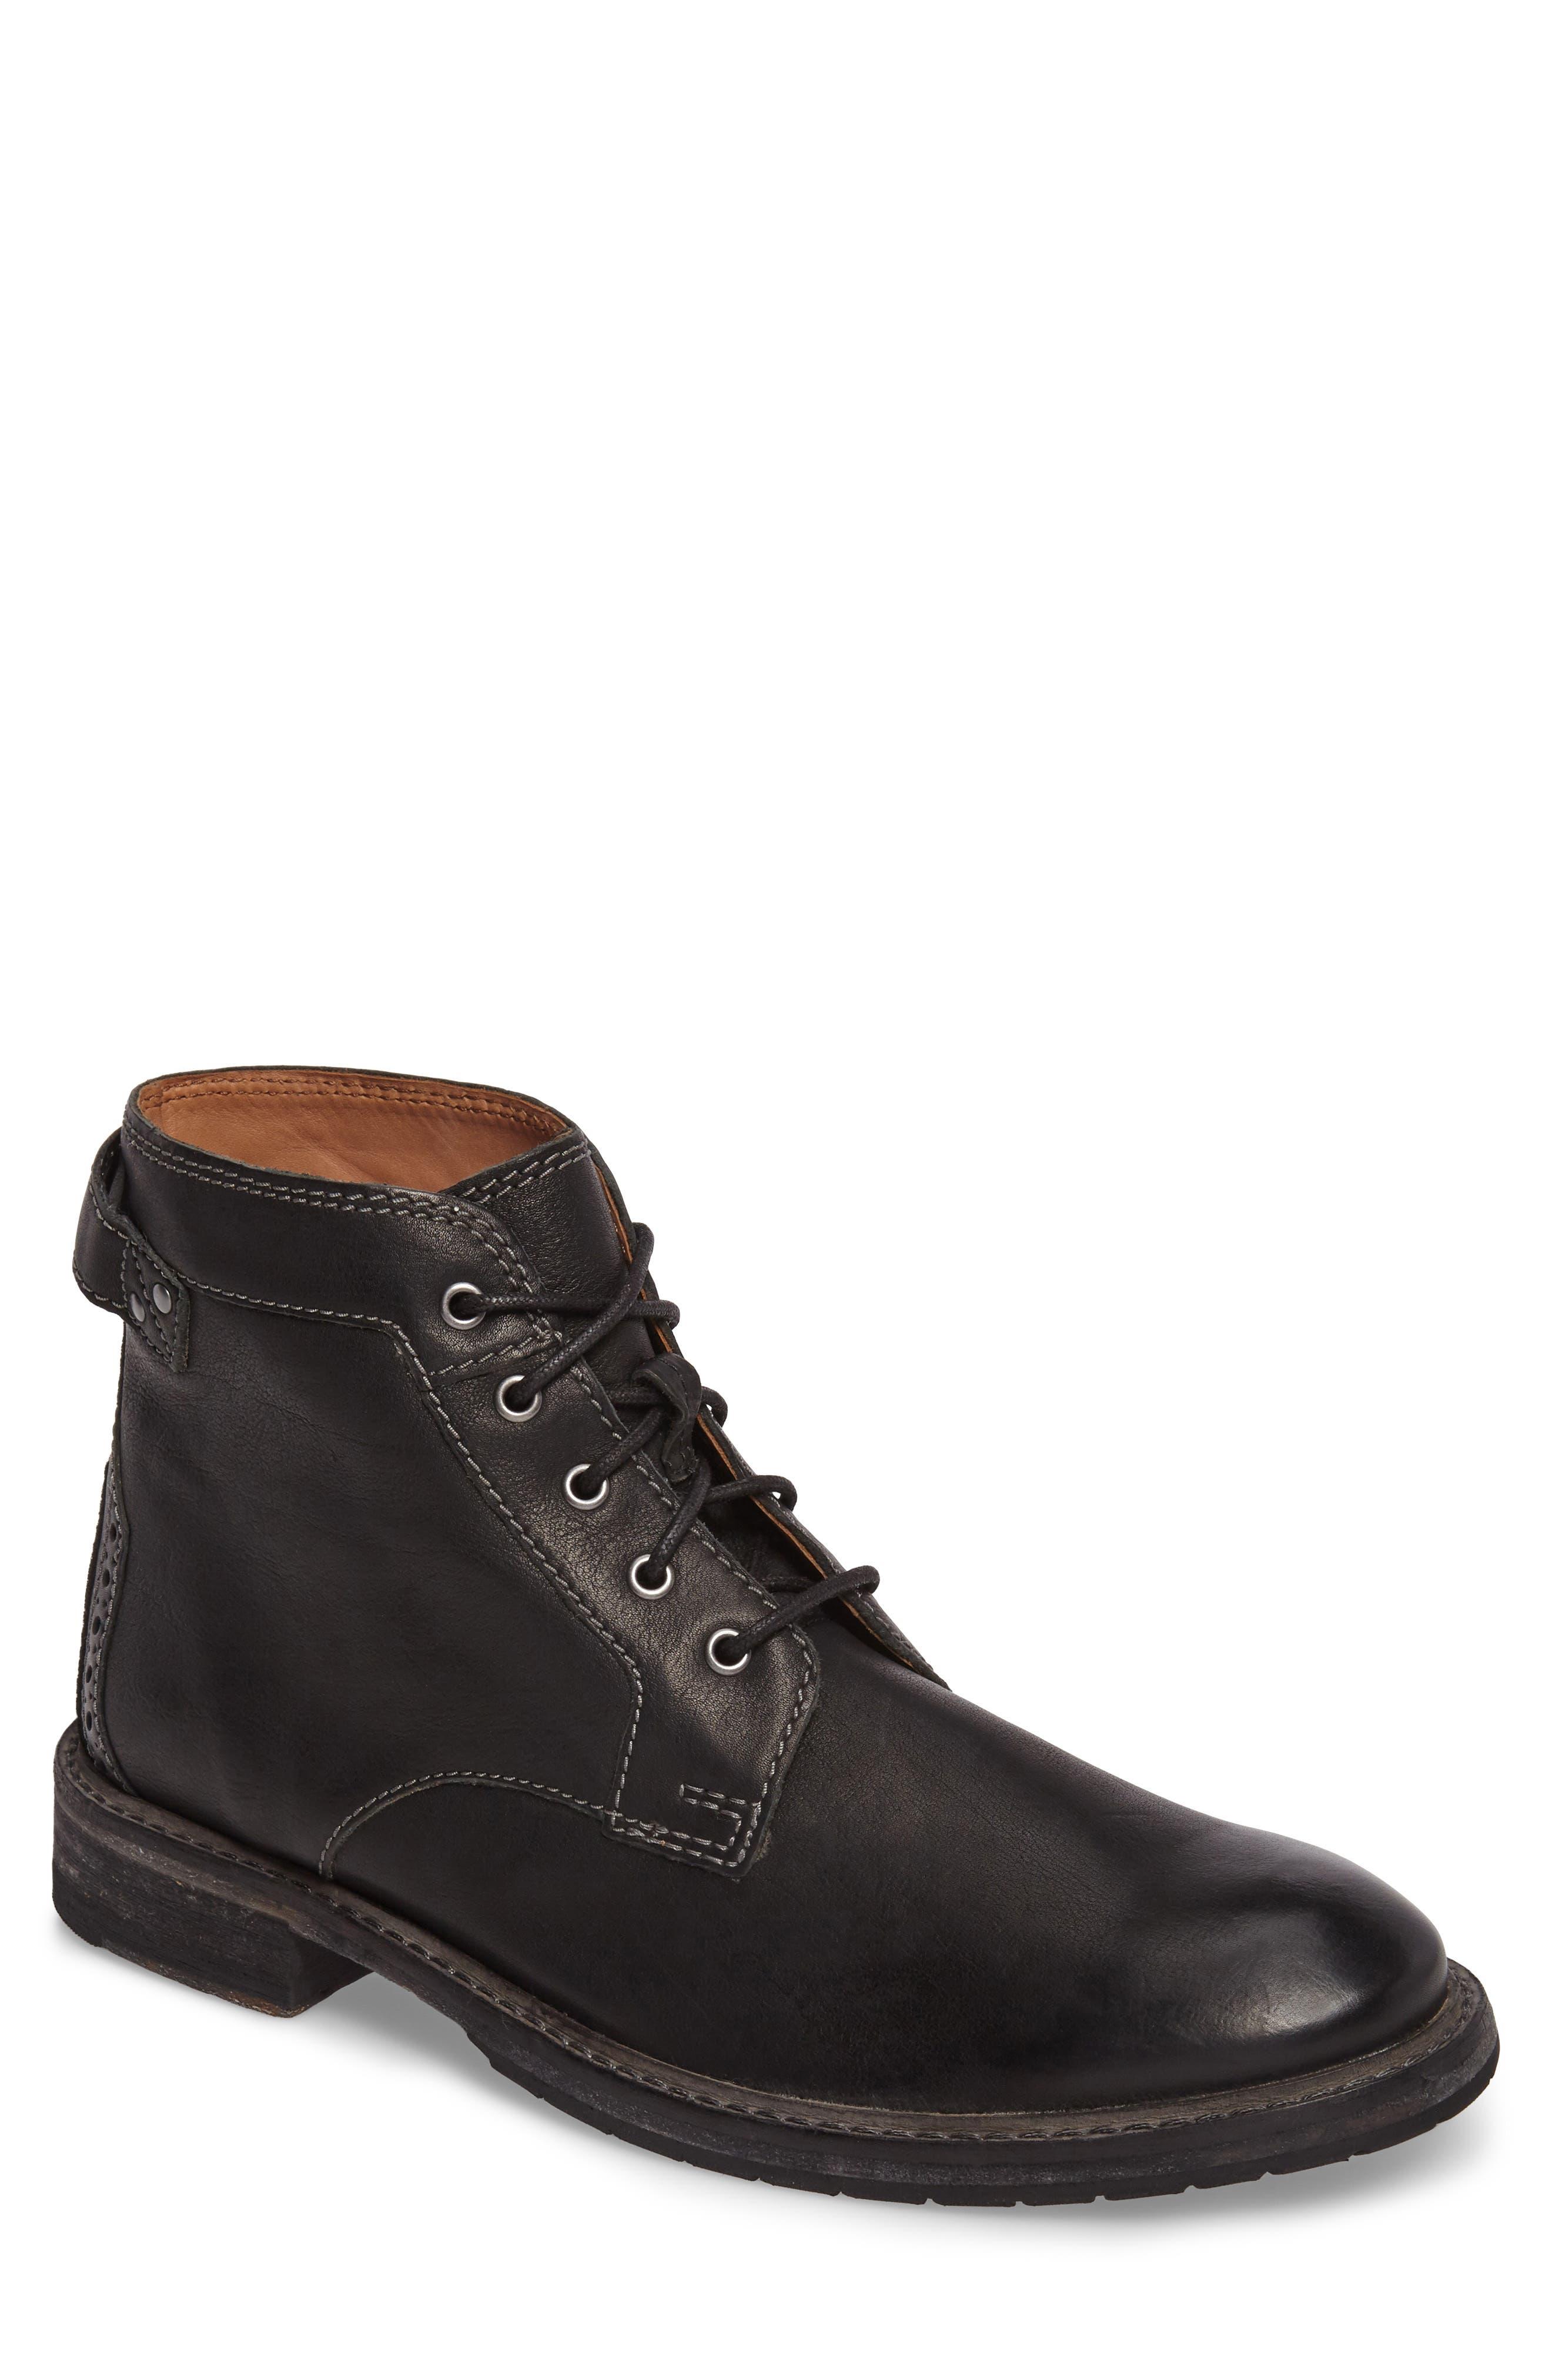 Clarks Clarkdale Bud Plain Toe Boot- Black